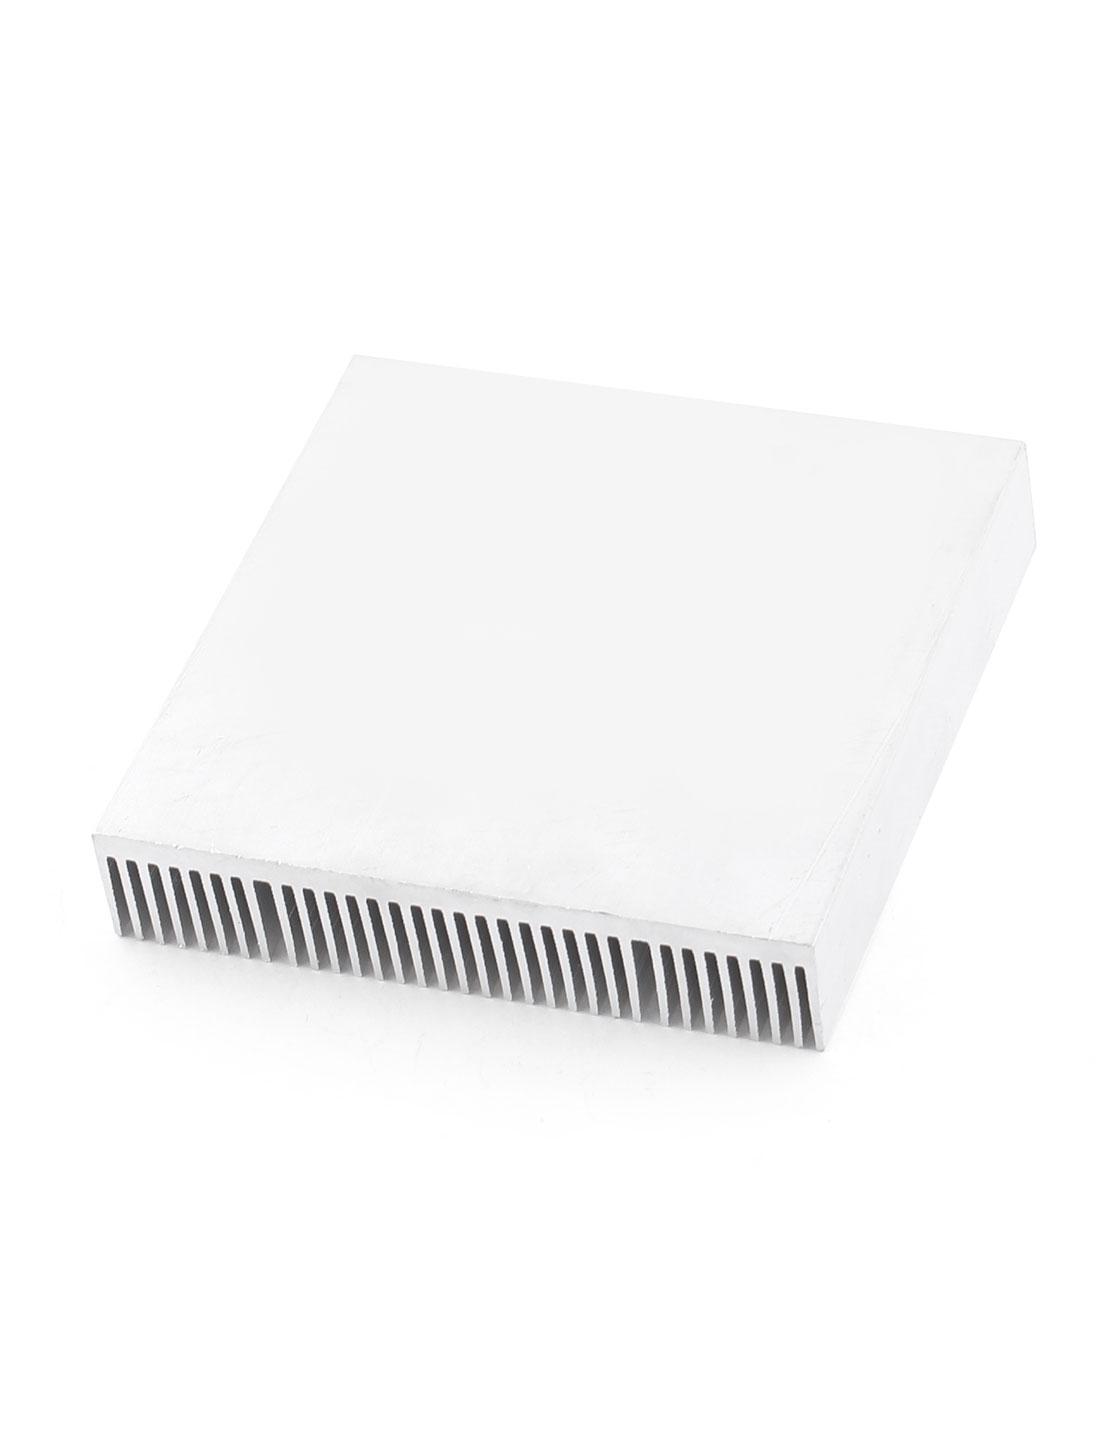 Silver Tone Aluminium Radiator LED Lamp Heatsink Heat Sink 100x102x20mm